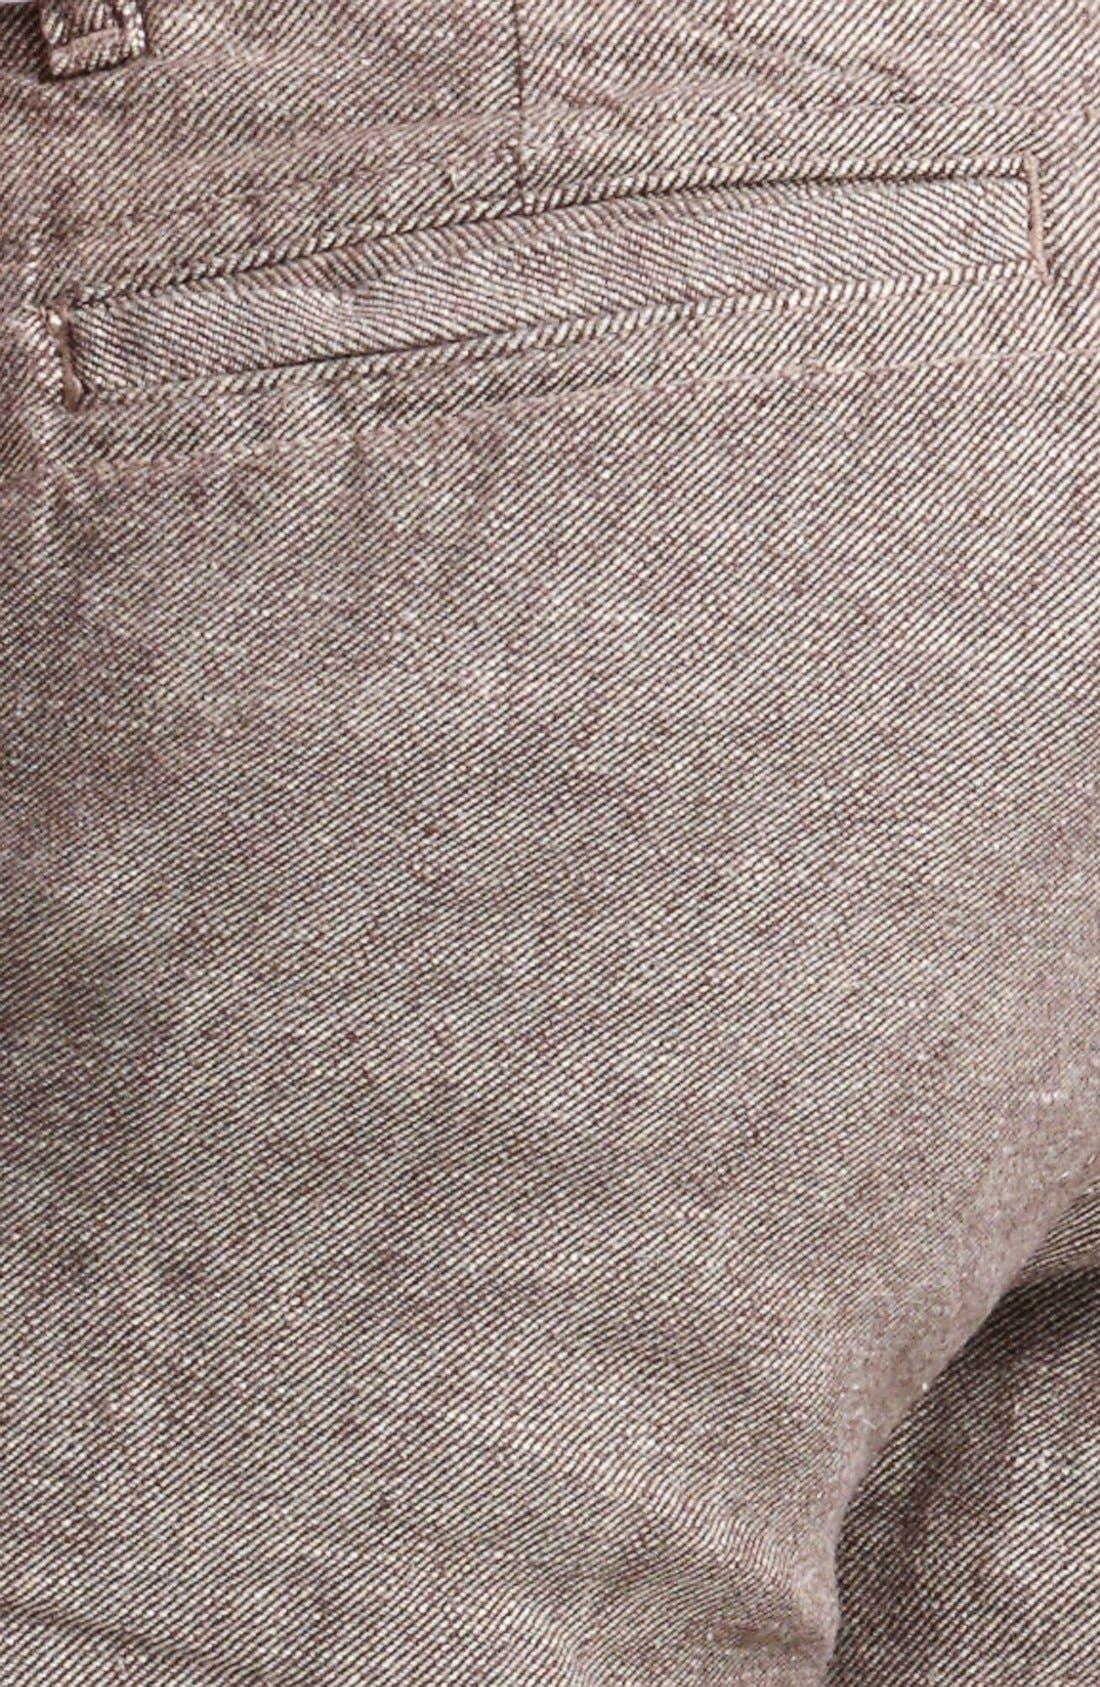 Alternate Image 3  - Billy Reid Cargo Shorts